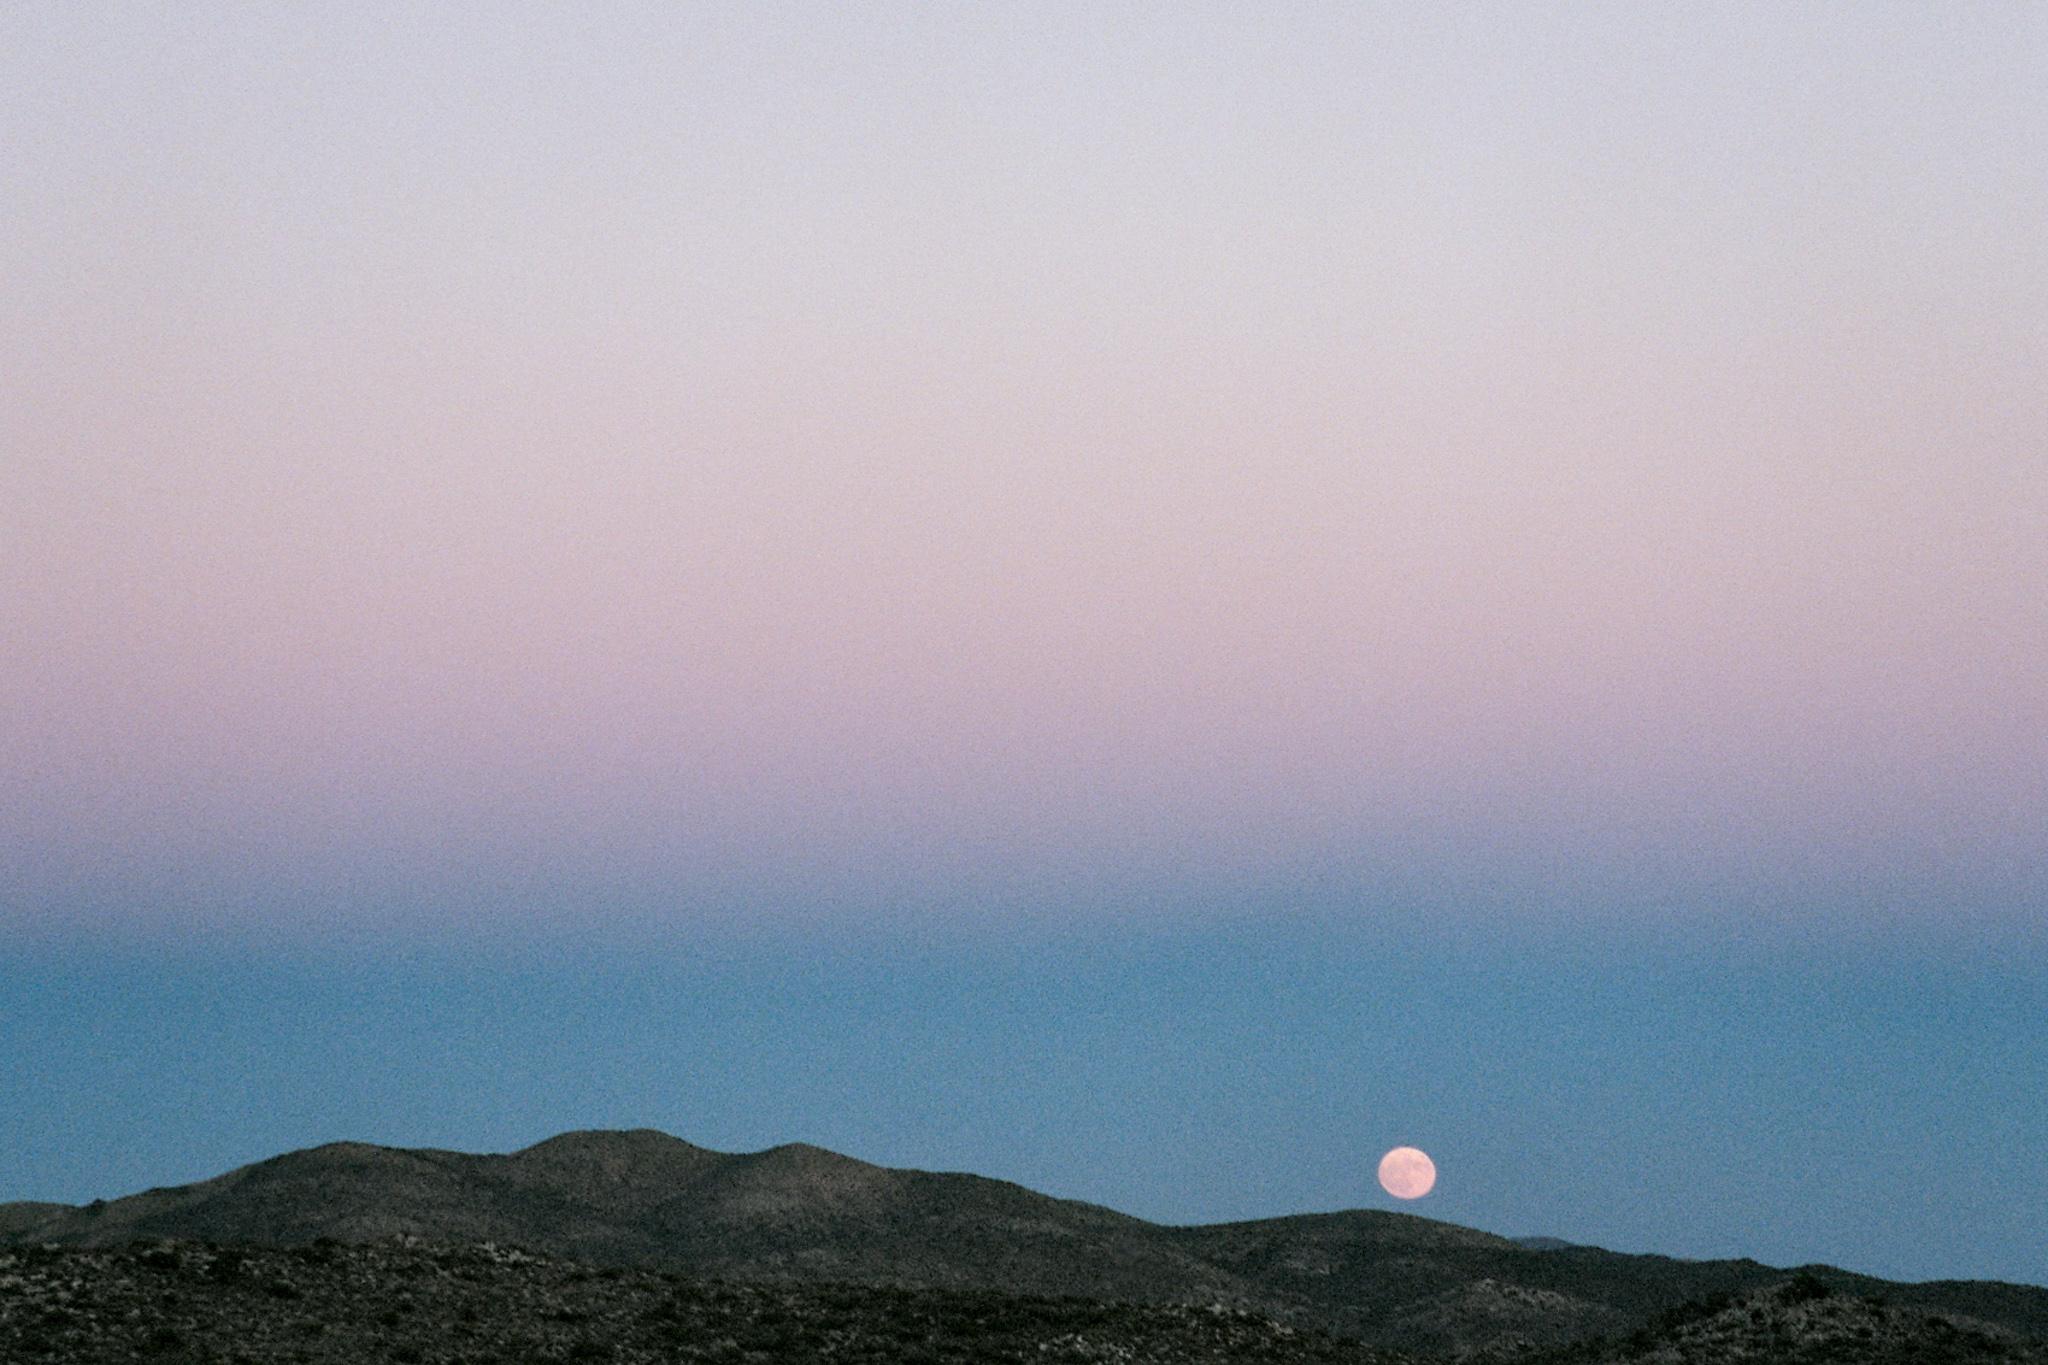 Joshua Tree National Park, 2016 #travel #35mm #film